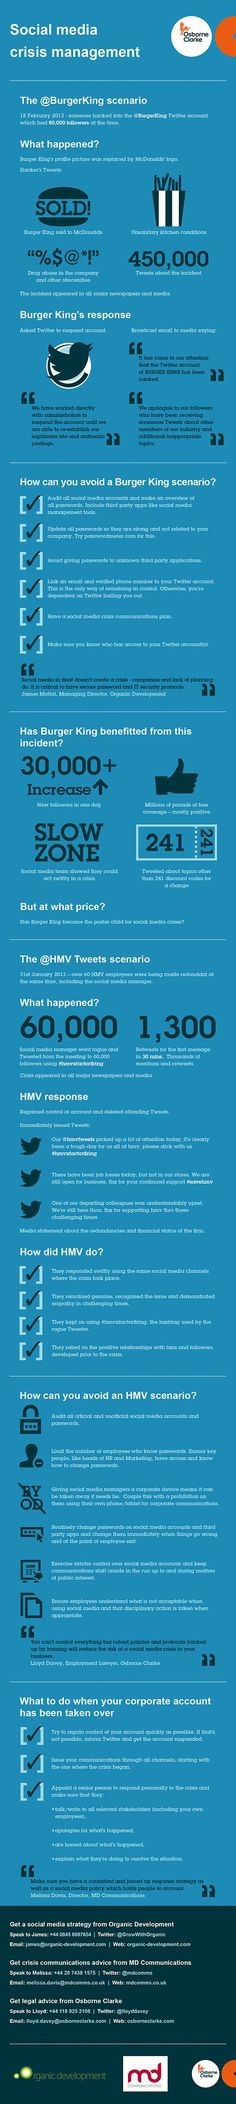 Good Infographic on Preventing a Social Media Crisis localbizconnect.com   #mobilewebsite